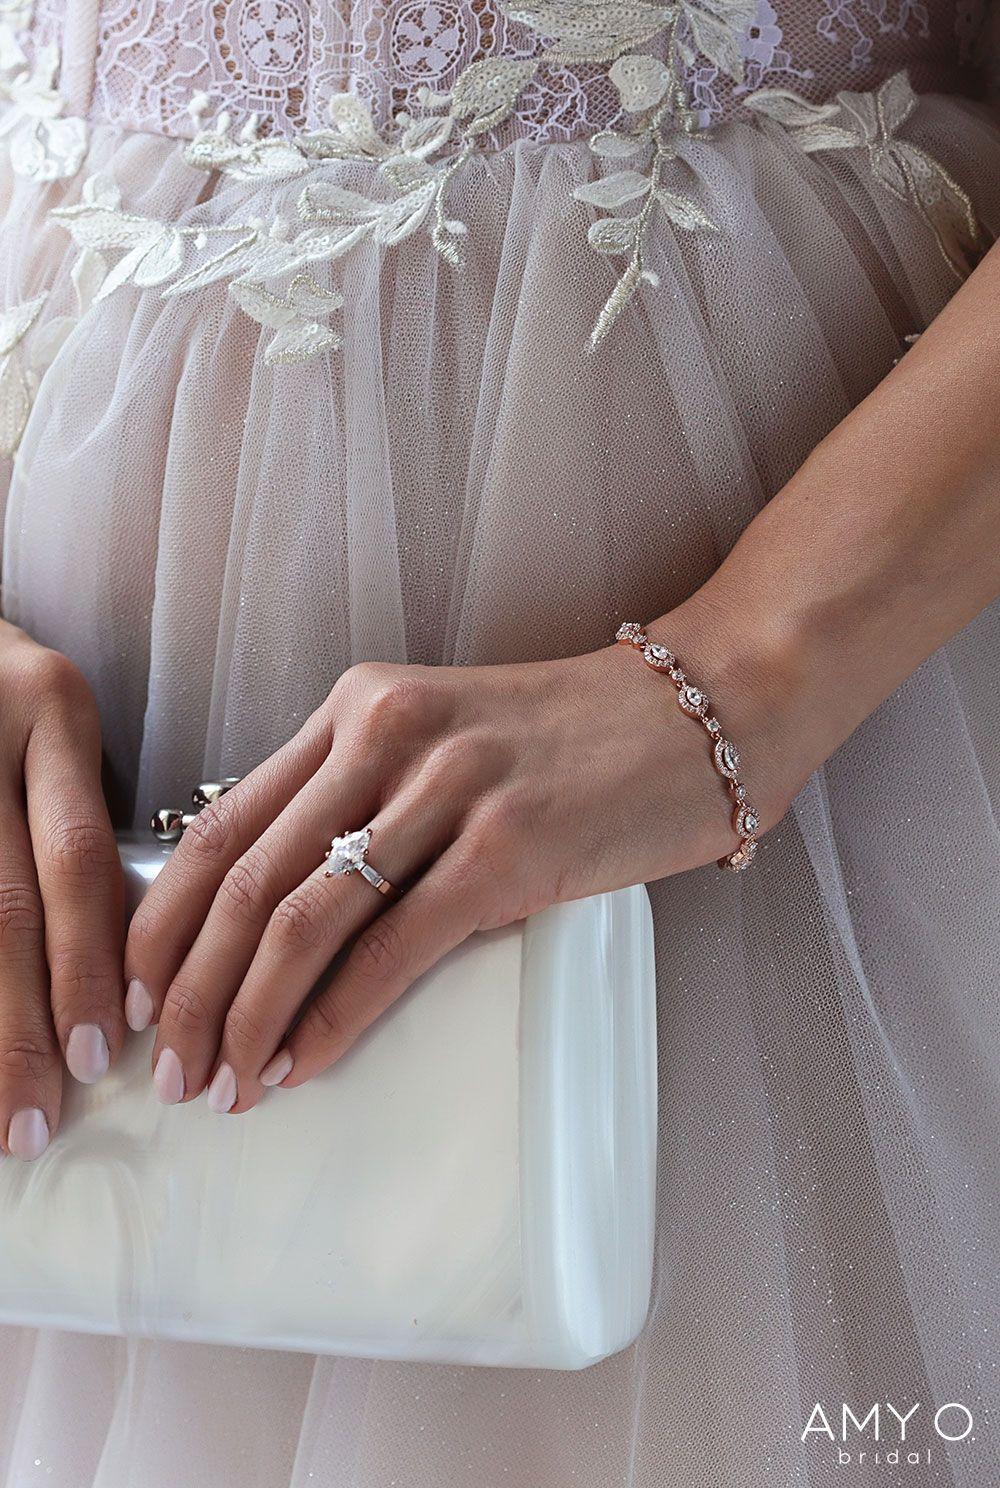 950ca693a Rose Gold Wedding Bracelet, Beautiful Bracelet, Wedding Jewelry Sets,  Jewelry for Wedding Dress